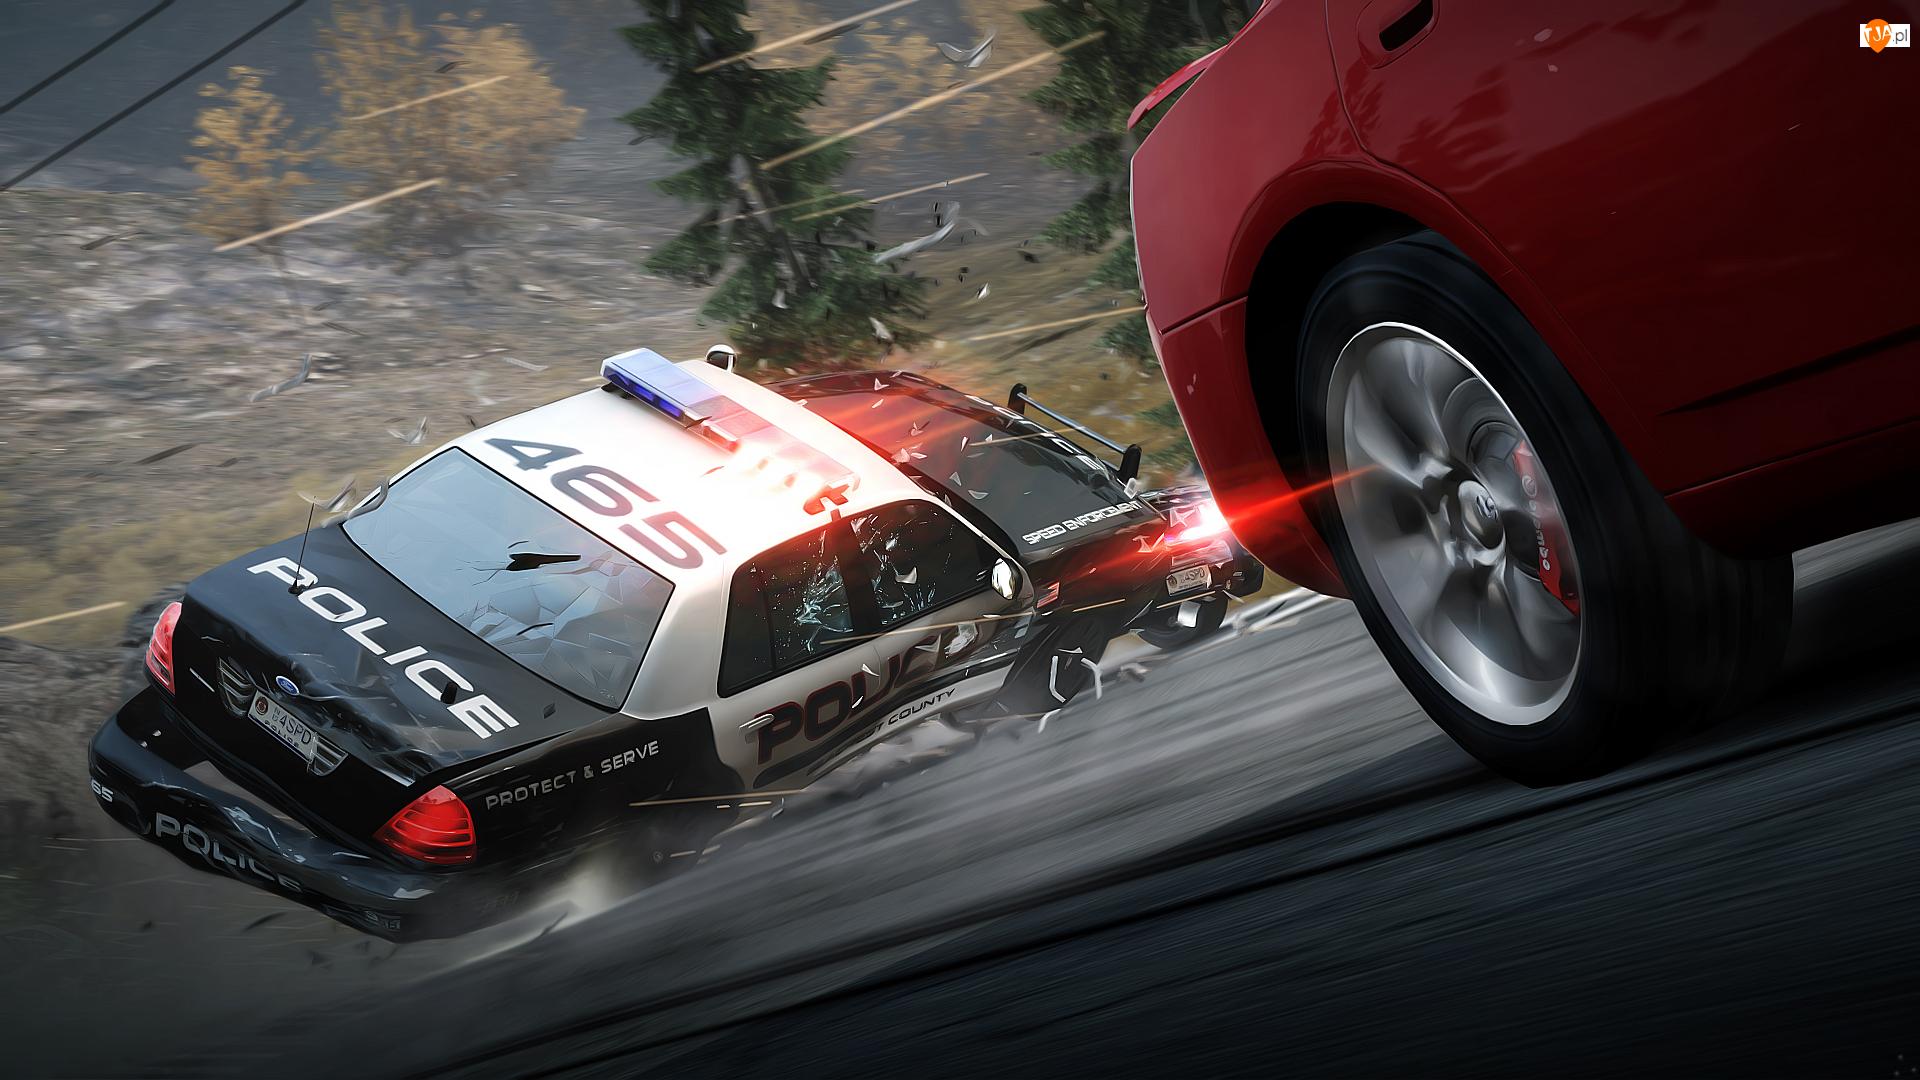 Scena, Ucieczka, Need for Speed Hot Pursuit, Gra, Pościg